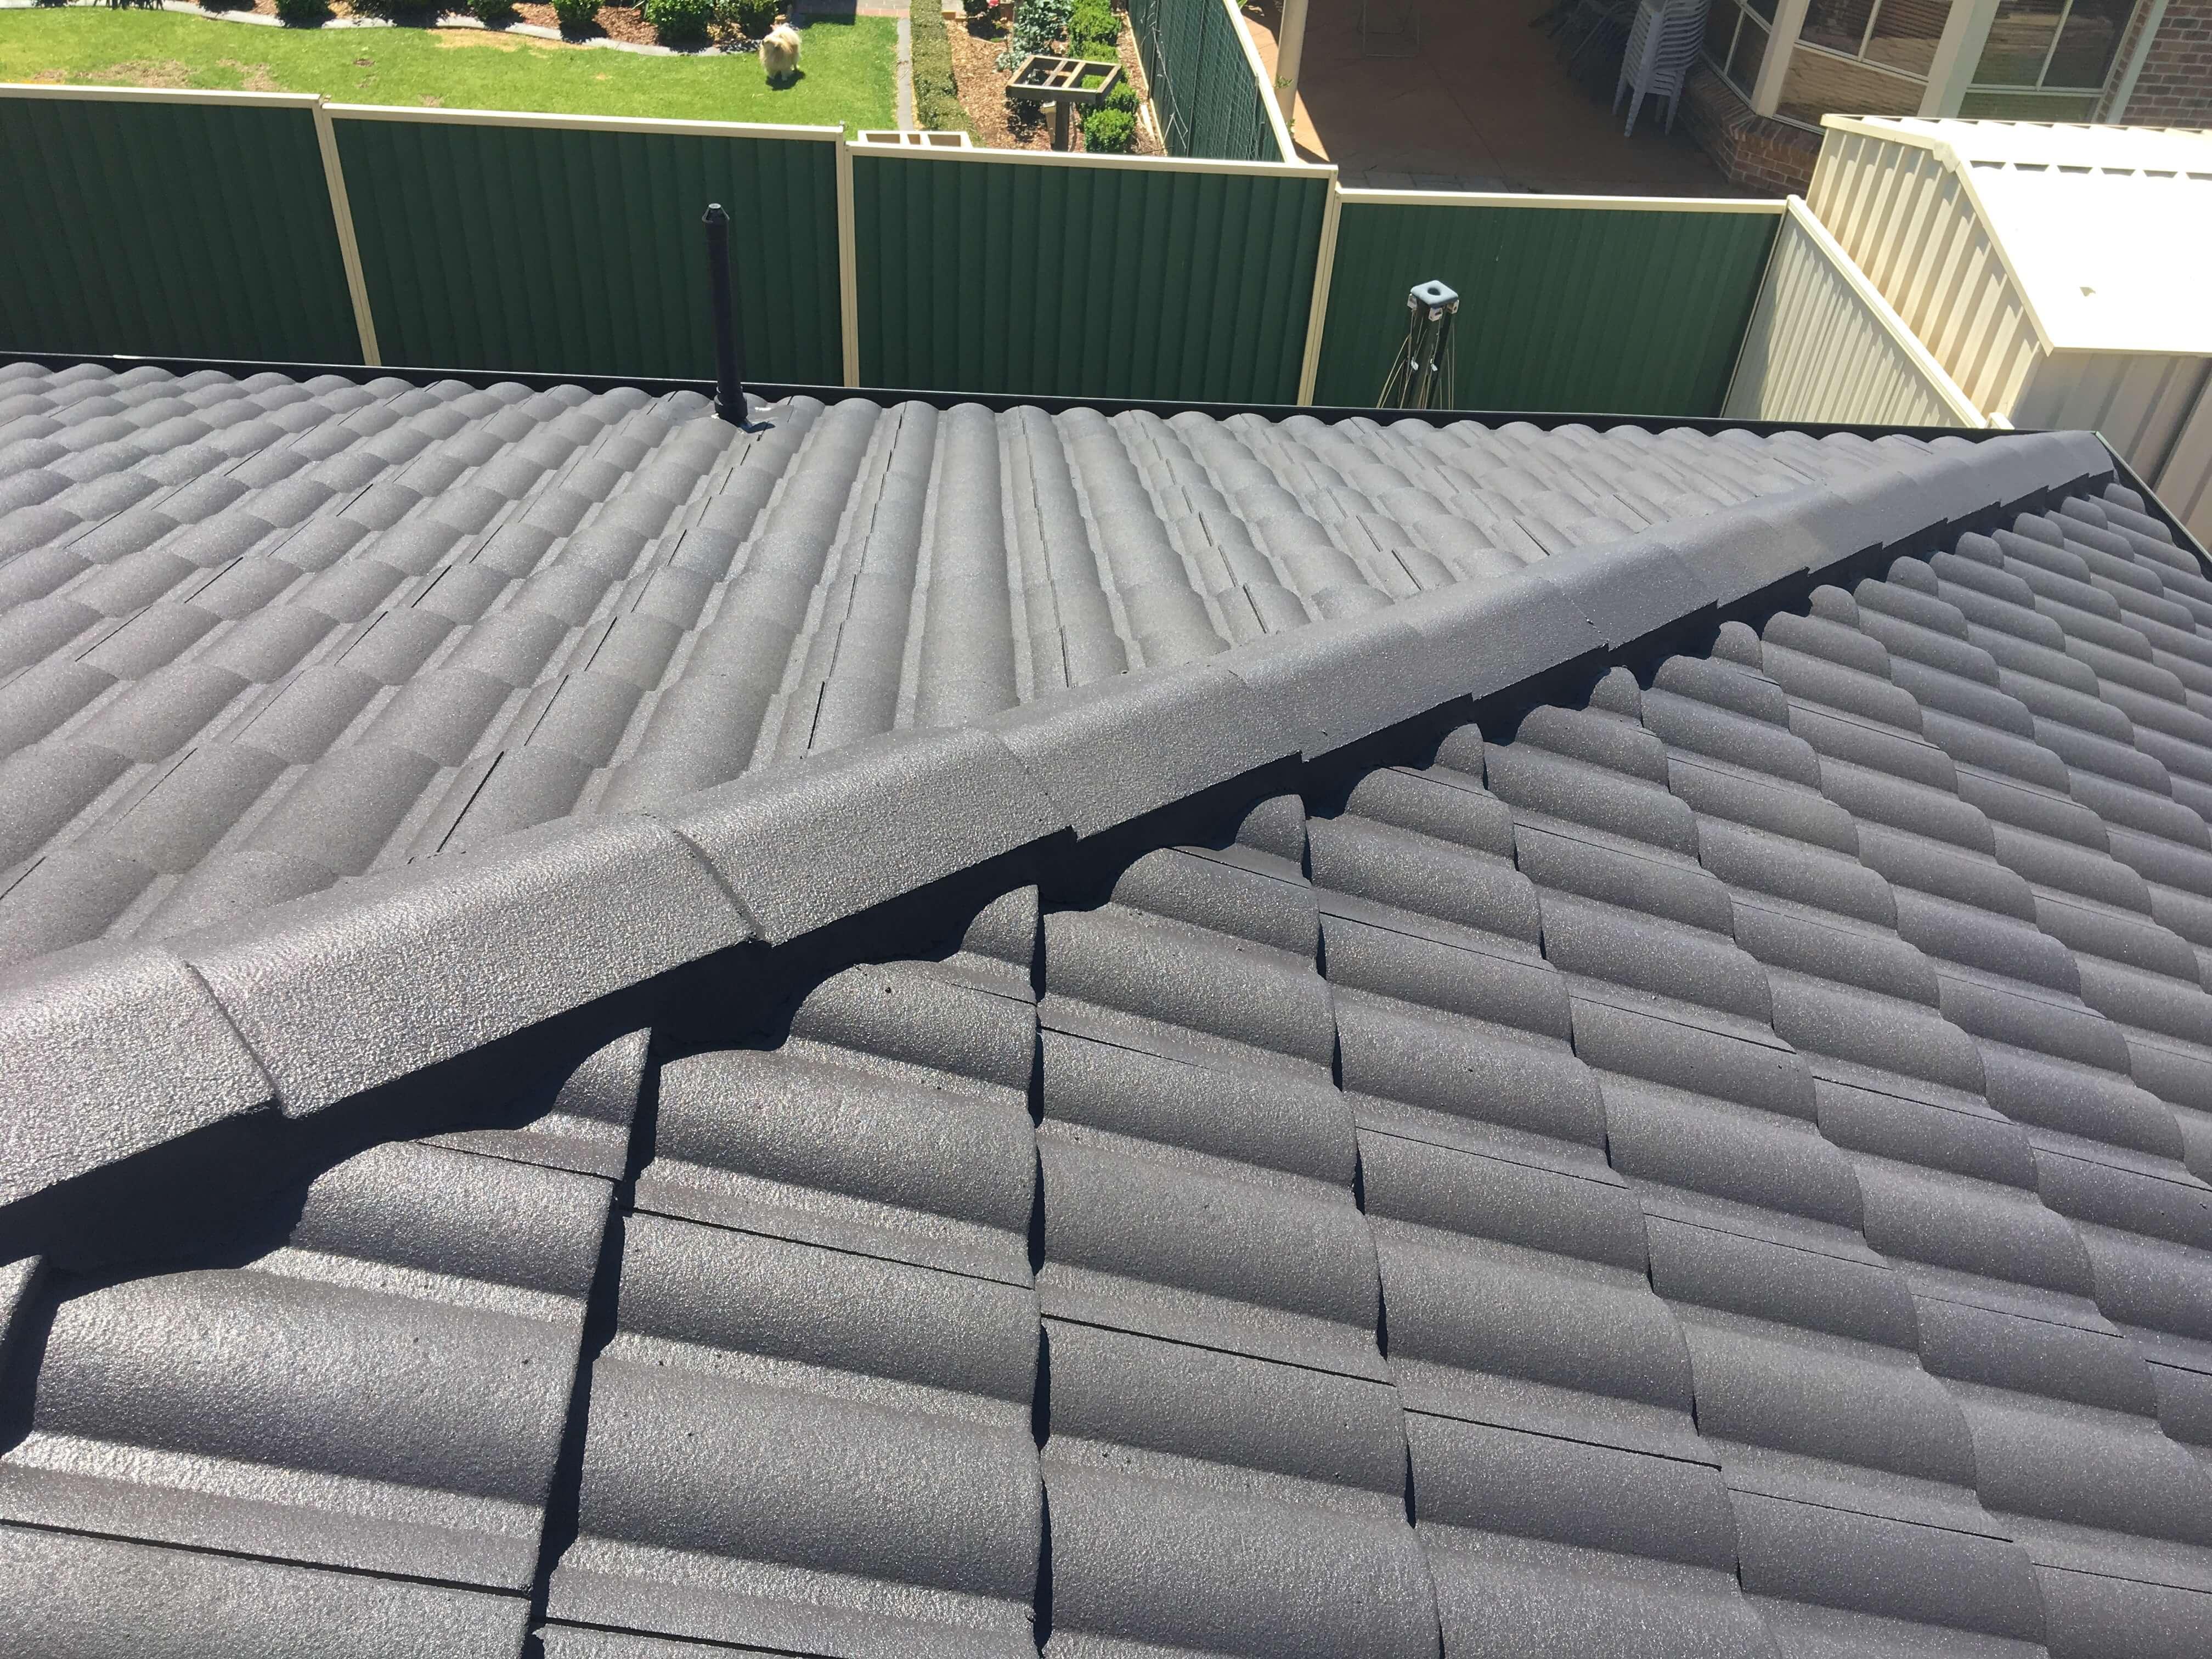 Cool Roof Coatings   Heat Reflective Roof Paints - United